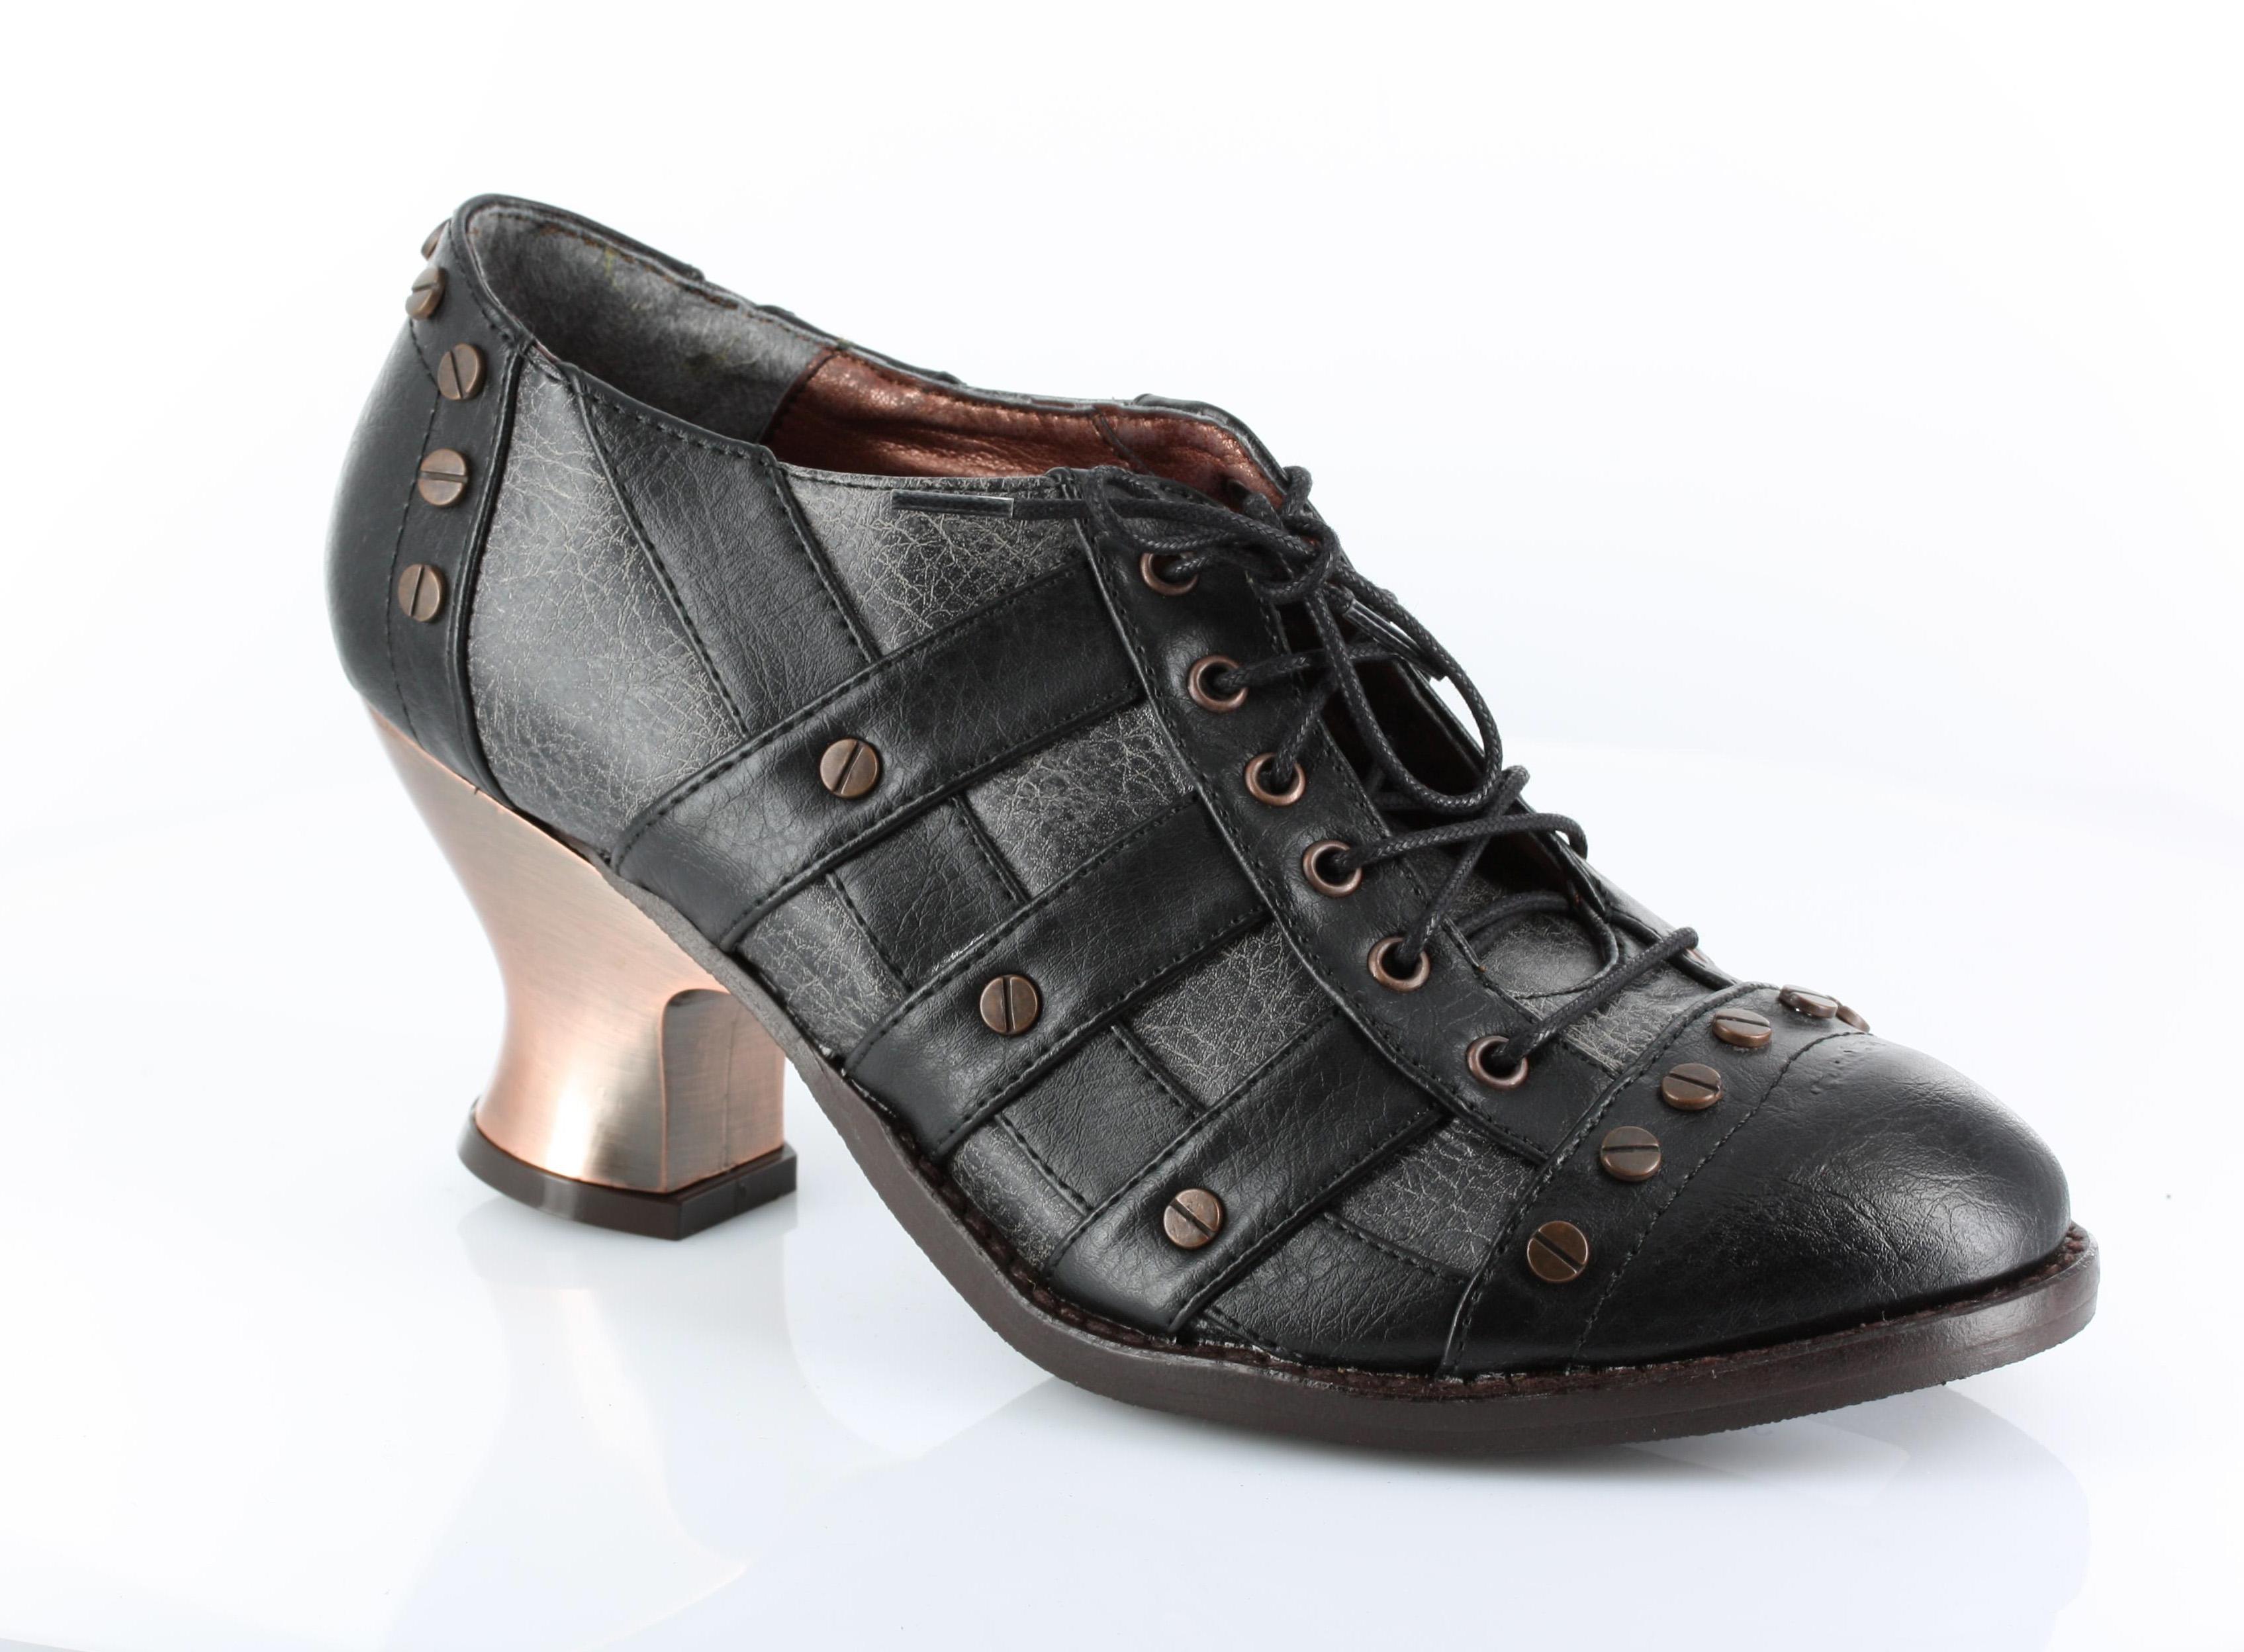 hades_shoes_jade_womens_black_victorian_shoes_booties_2.jpg